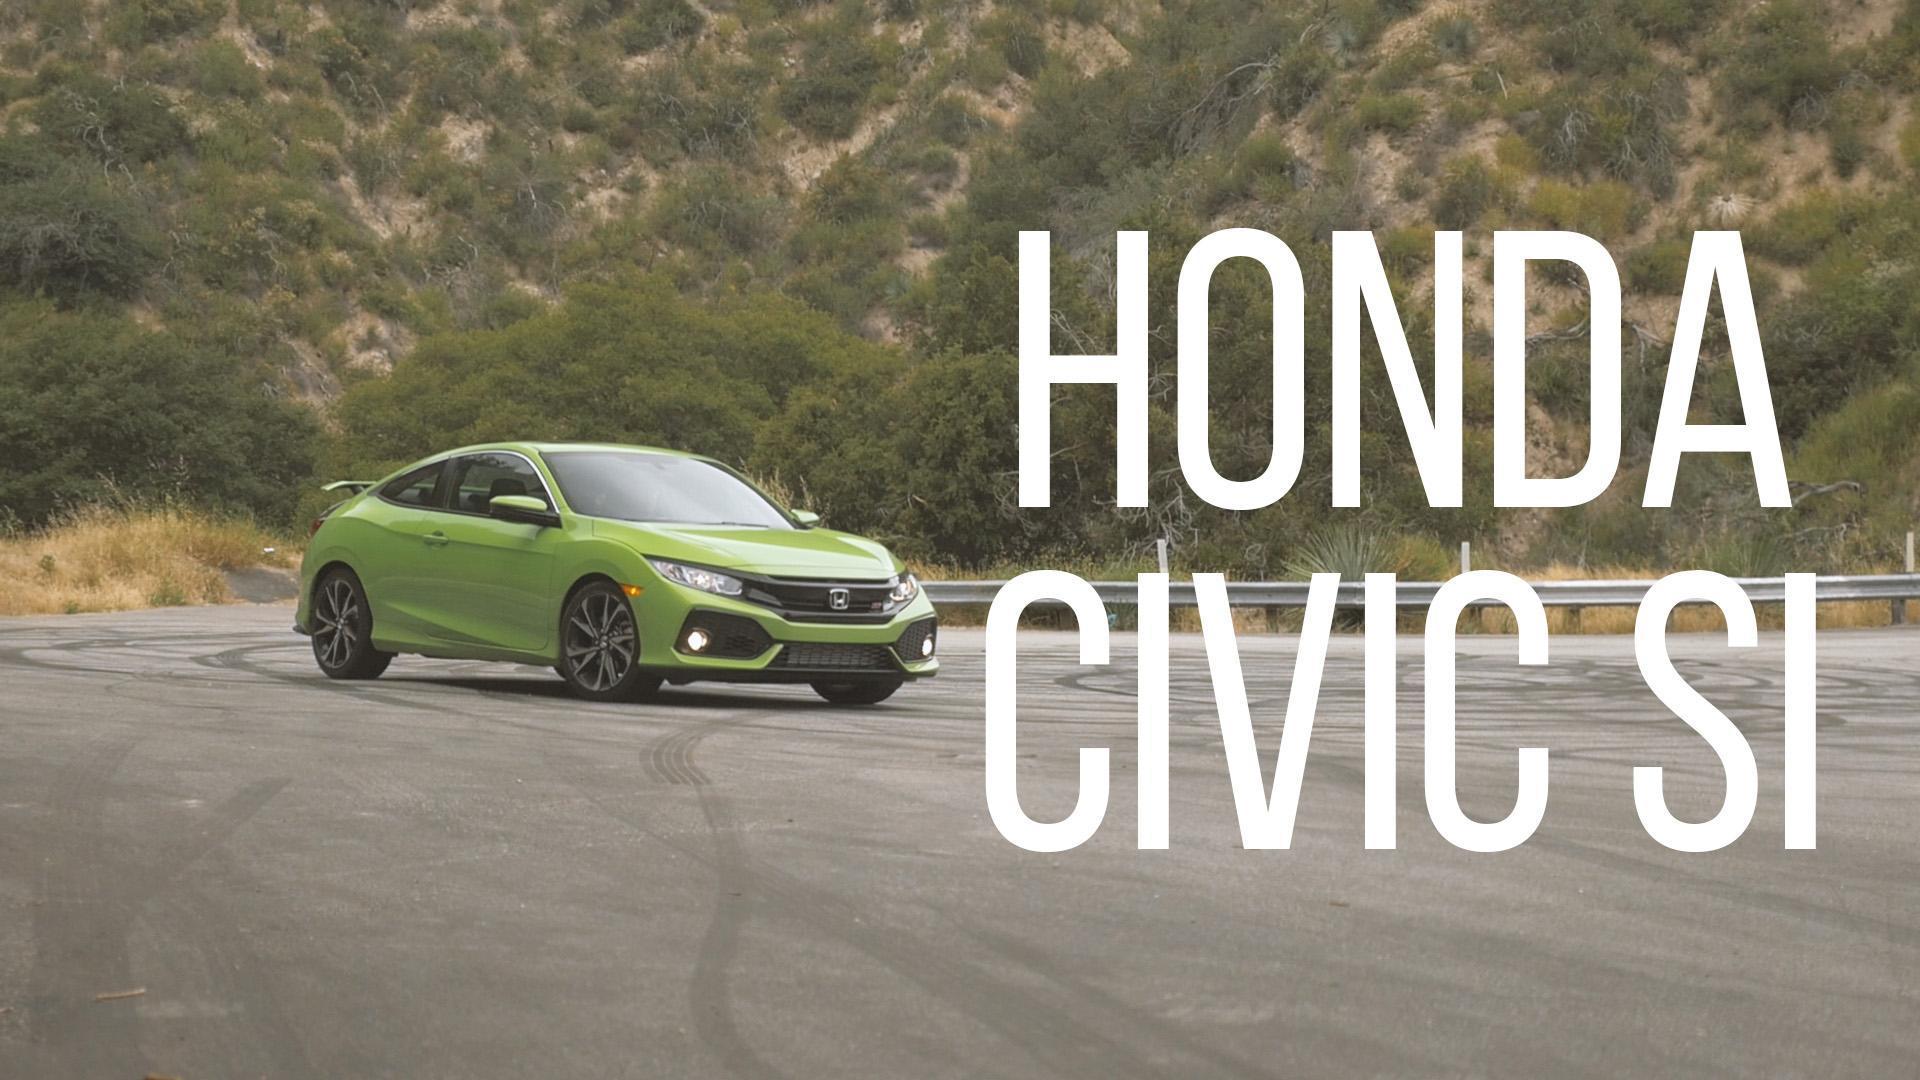 honda urban ev confirmed for 2019 launch in europe | autoblog